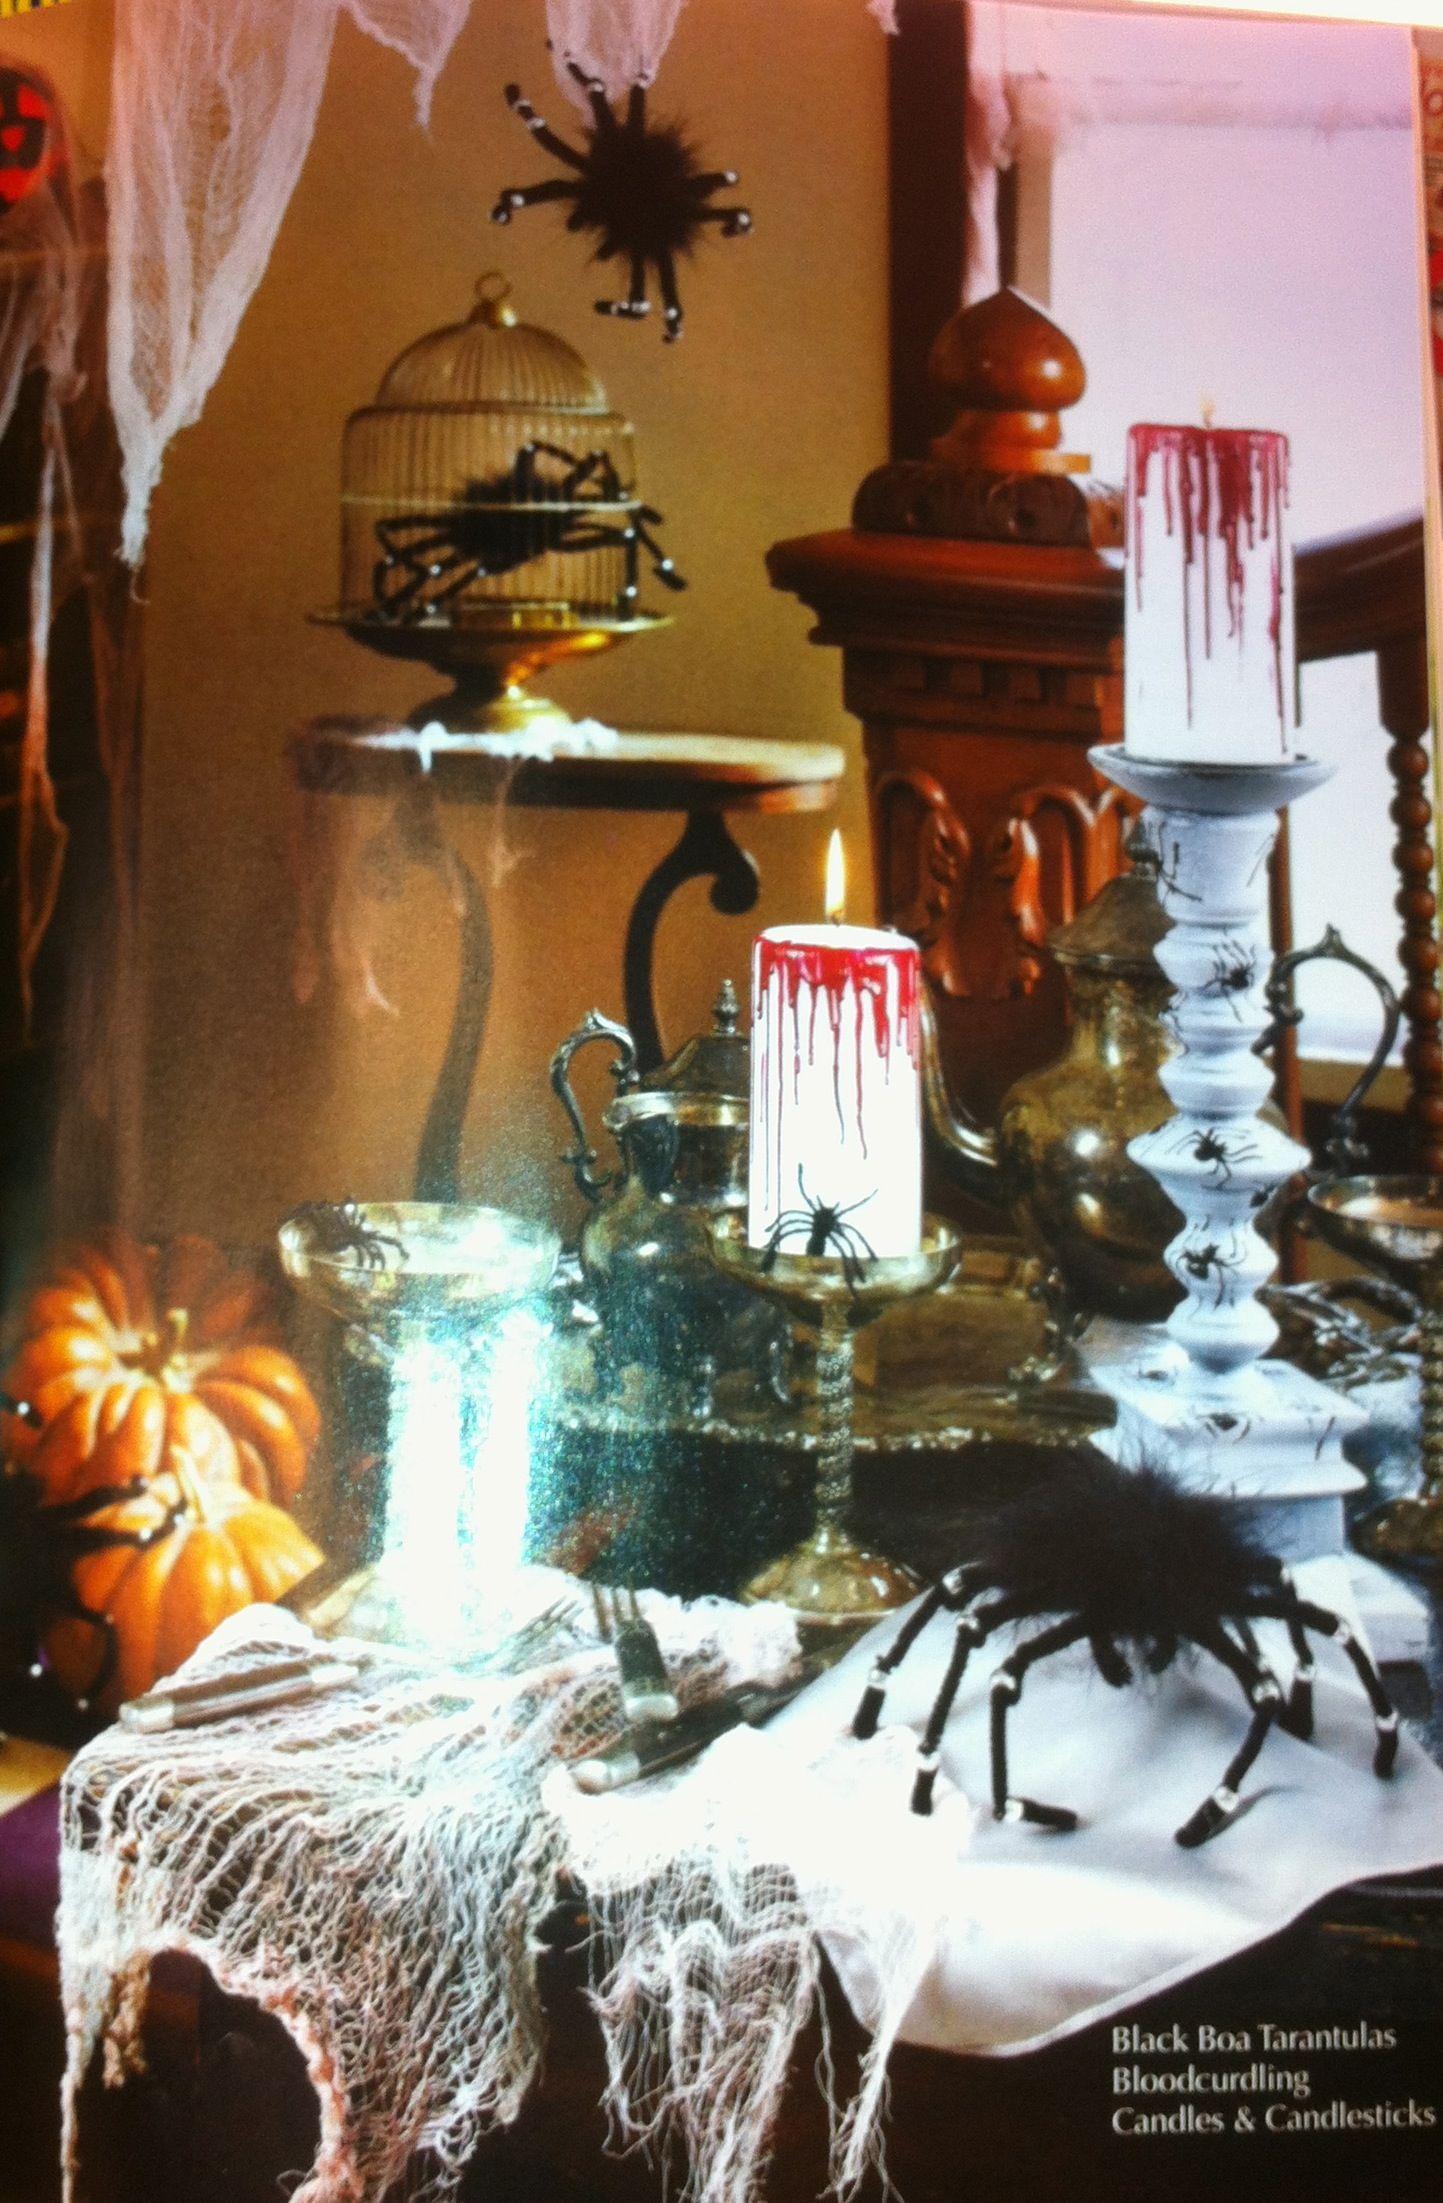 decoration ideas halloween decorations ideas pinterest. Black Bedroom Furniture Sets. Home Design Ideas